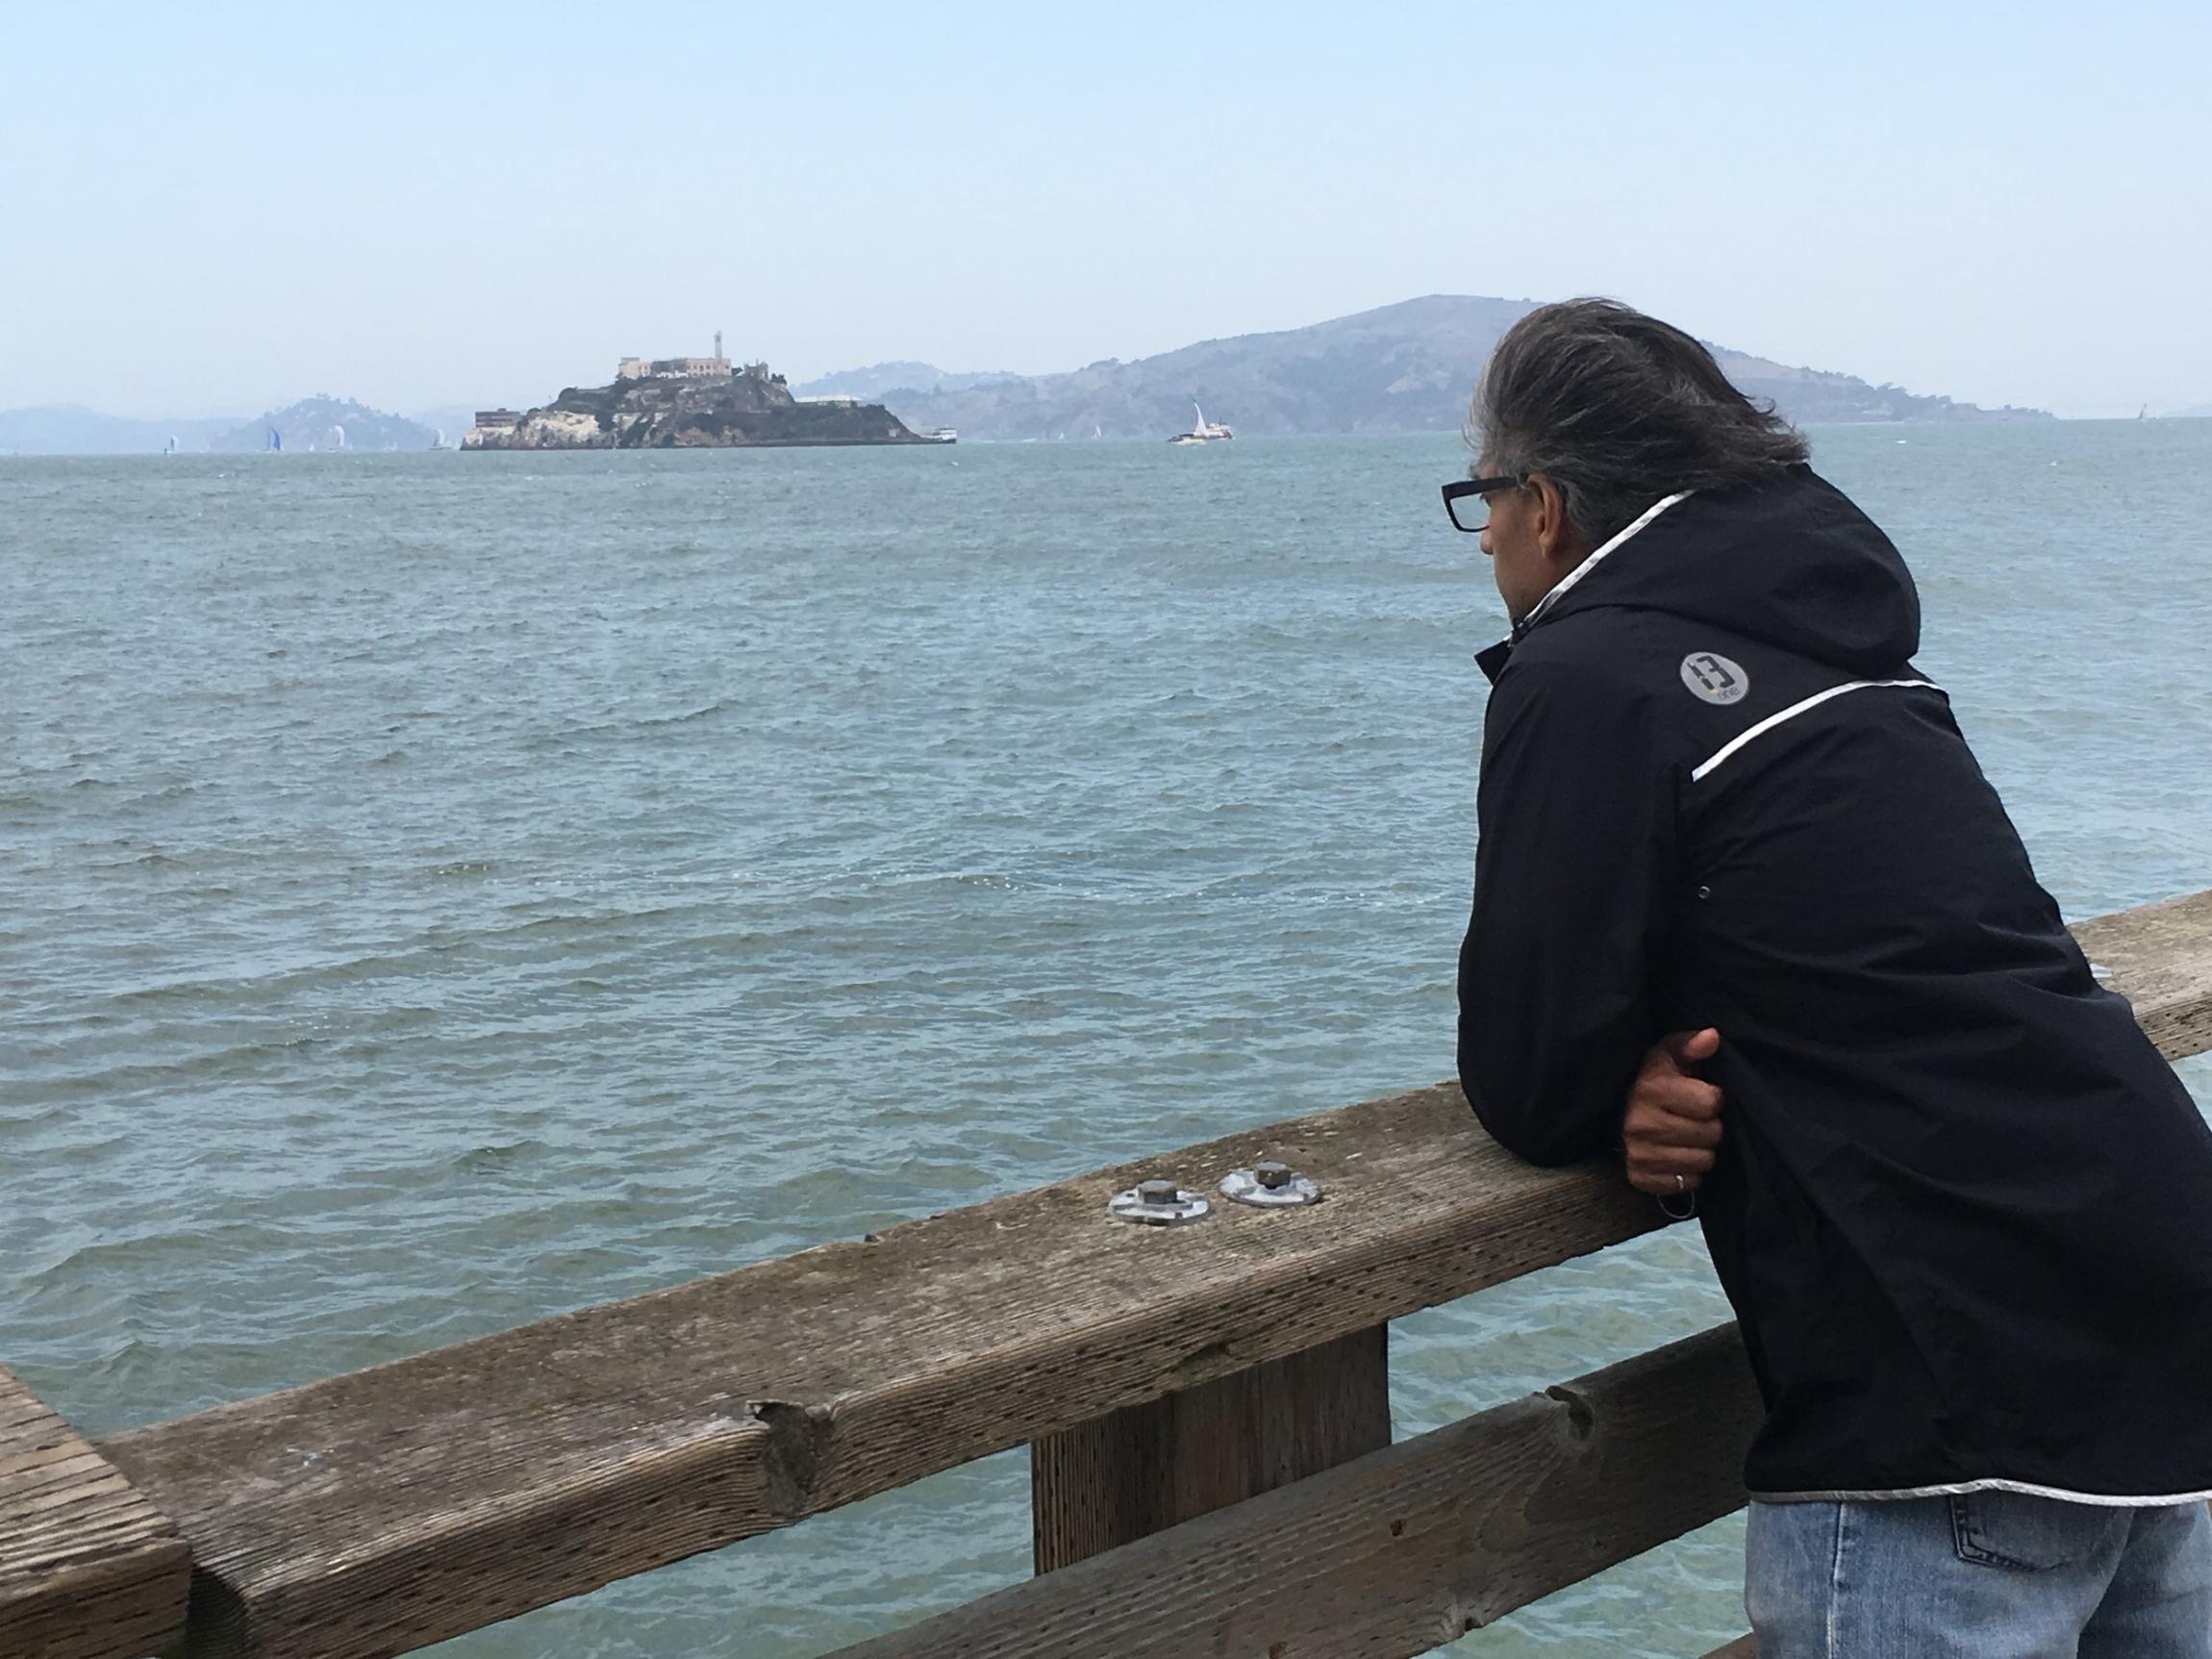 Enjoying the moment, San Francisco, California